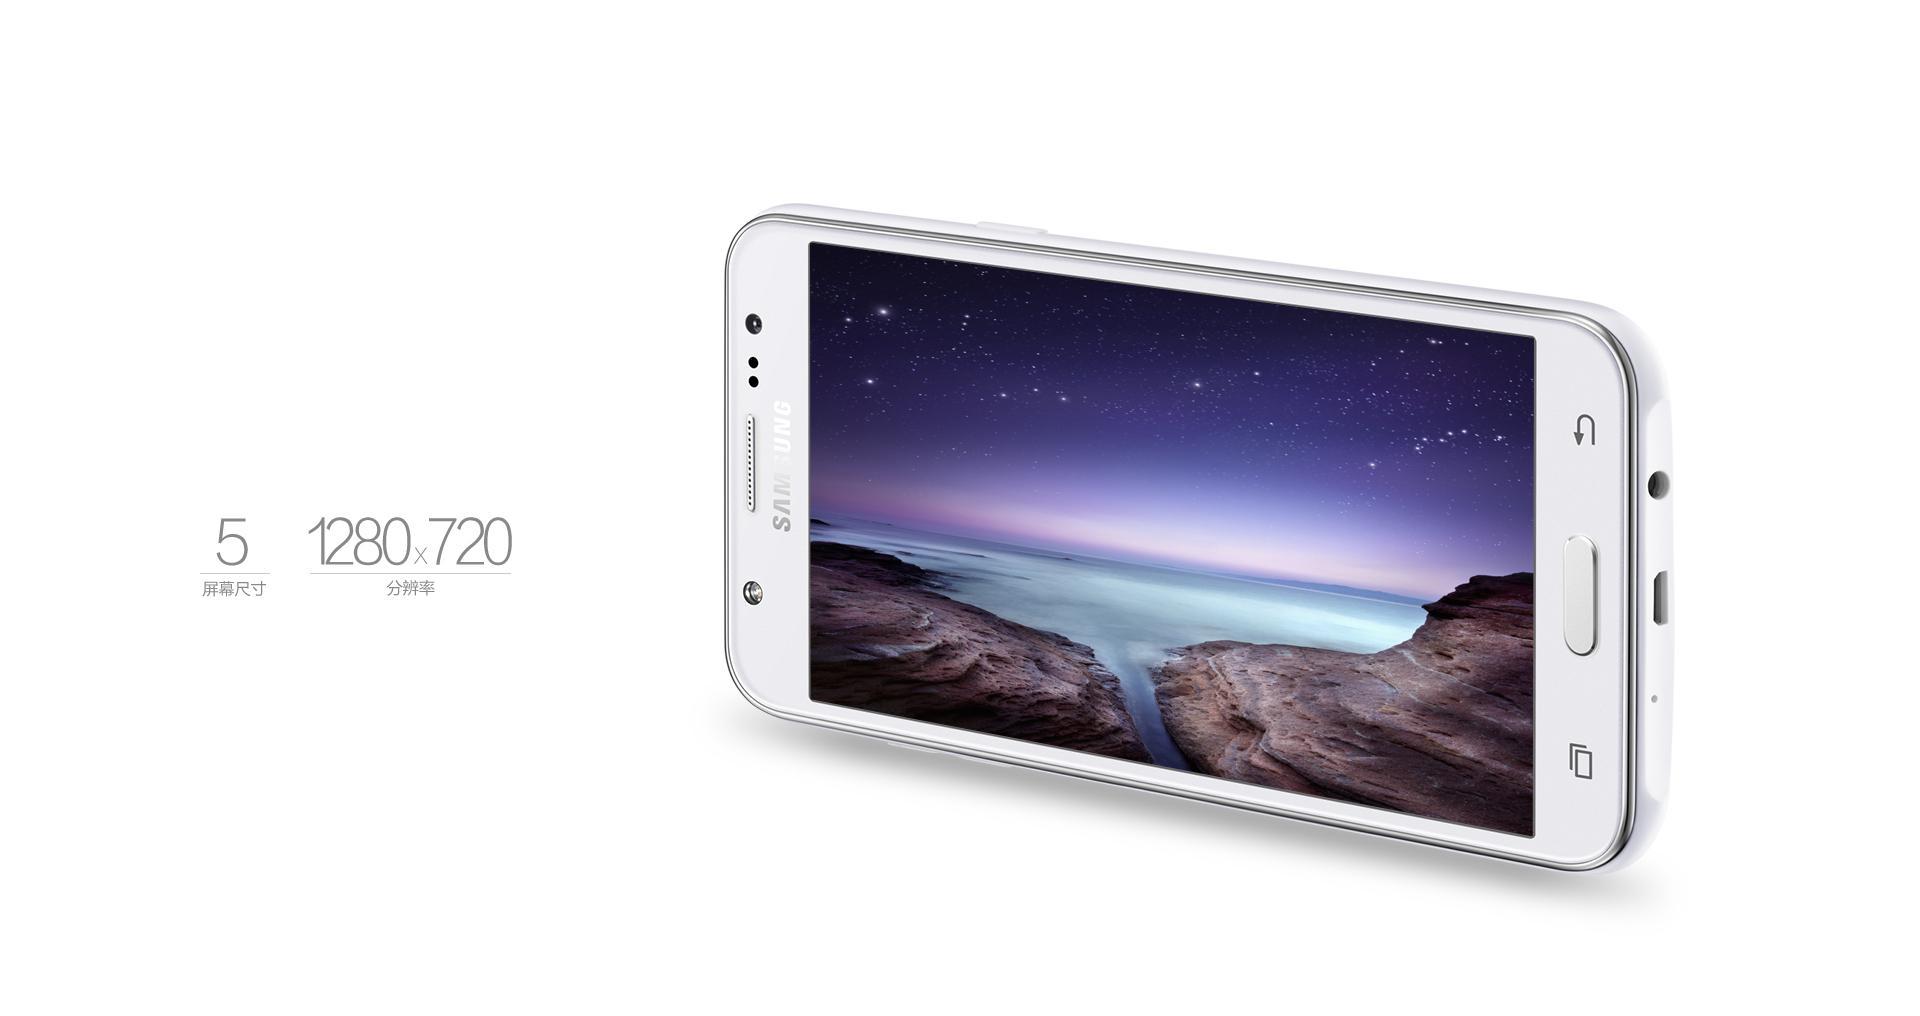 Samsung Galaxy J5, Galaxy J7 tout front-facing LED flash - SlashGear